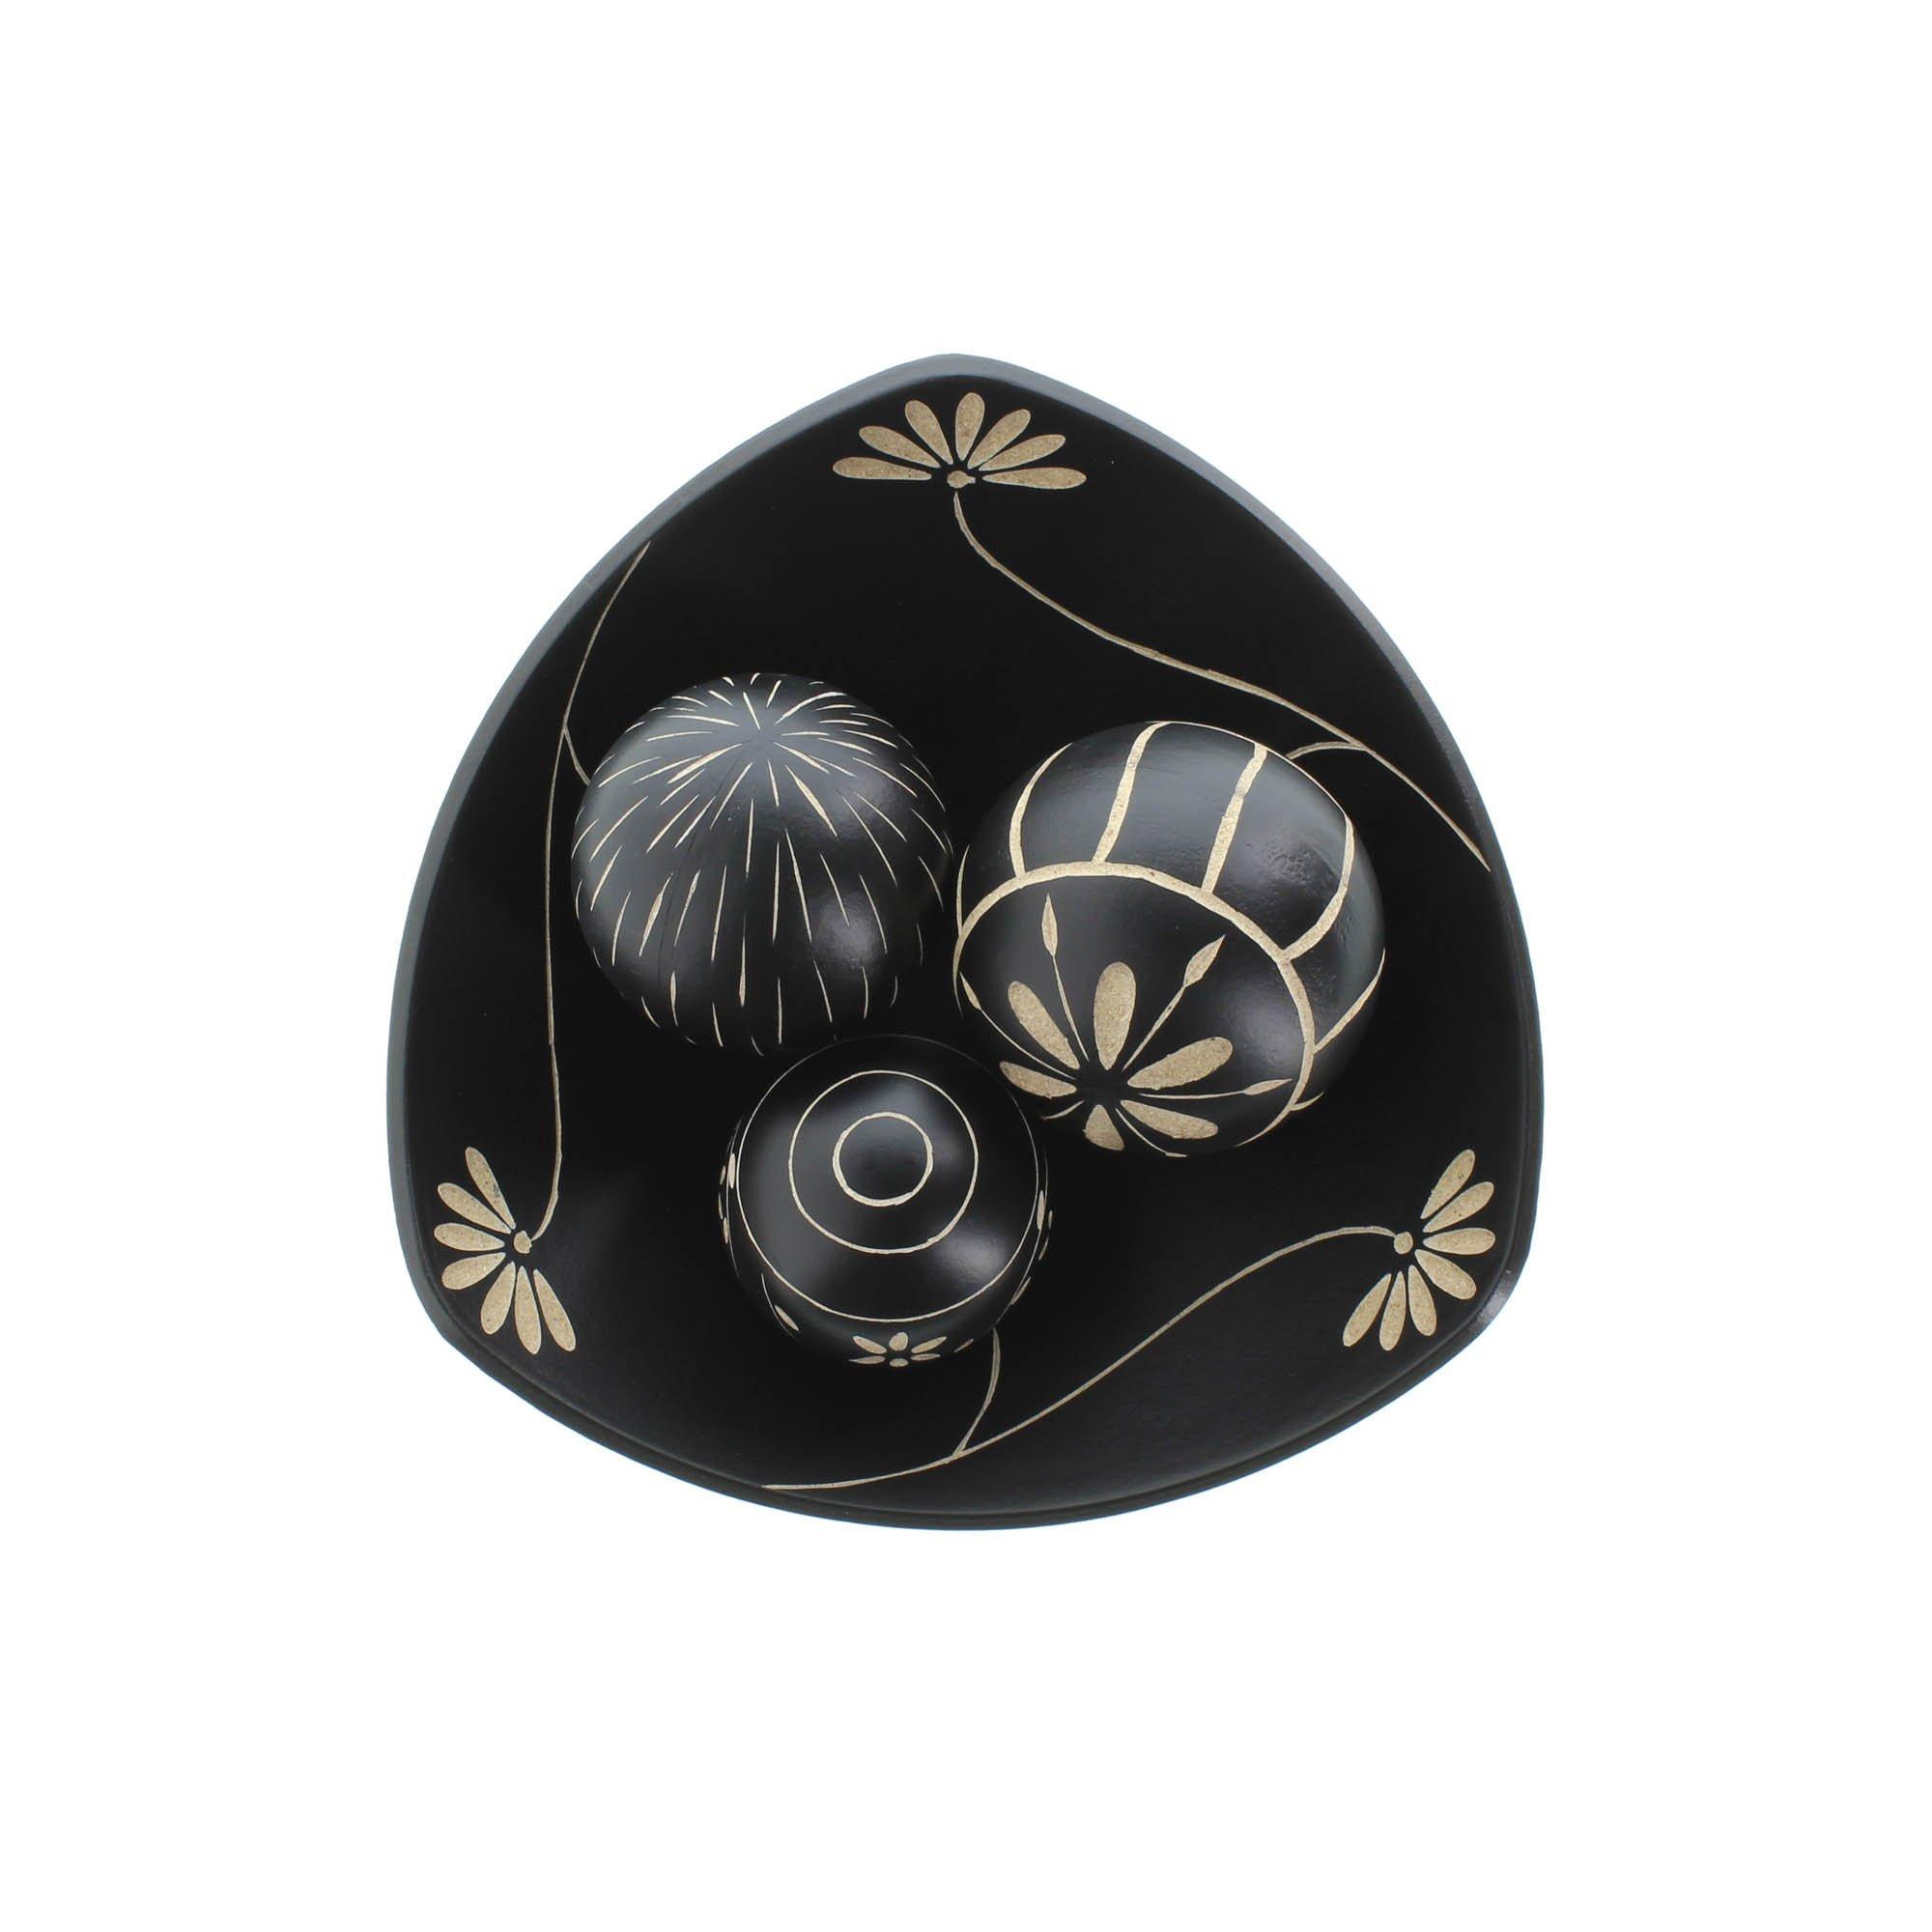 Black Decorative Balls For Bowls Entrancing Decorative Balls Bowl 3 Decorator Balls For Bowls  Black Decor Inspiration Design